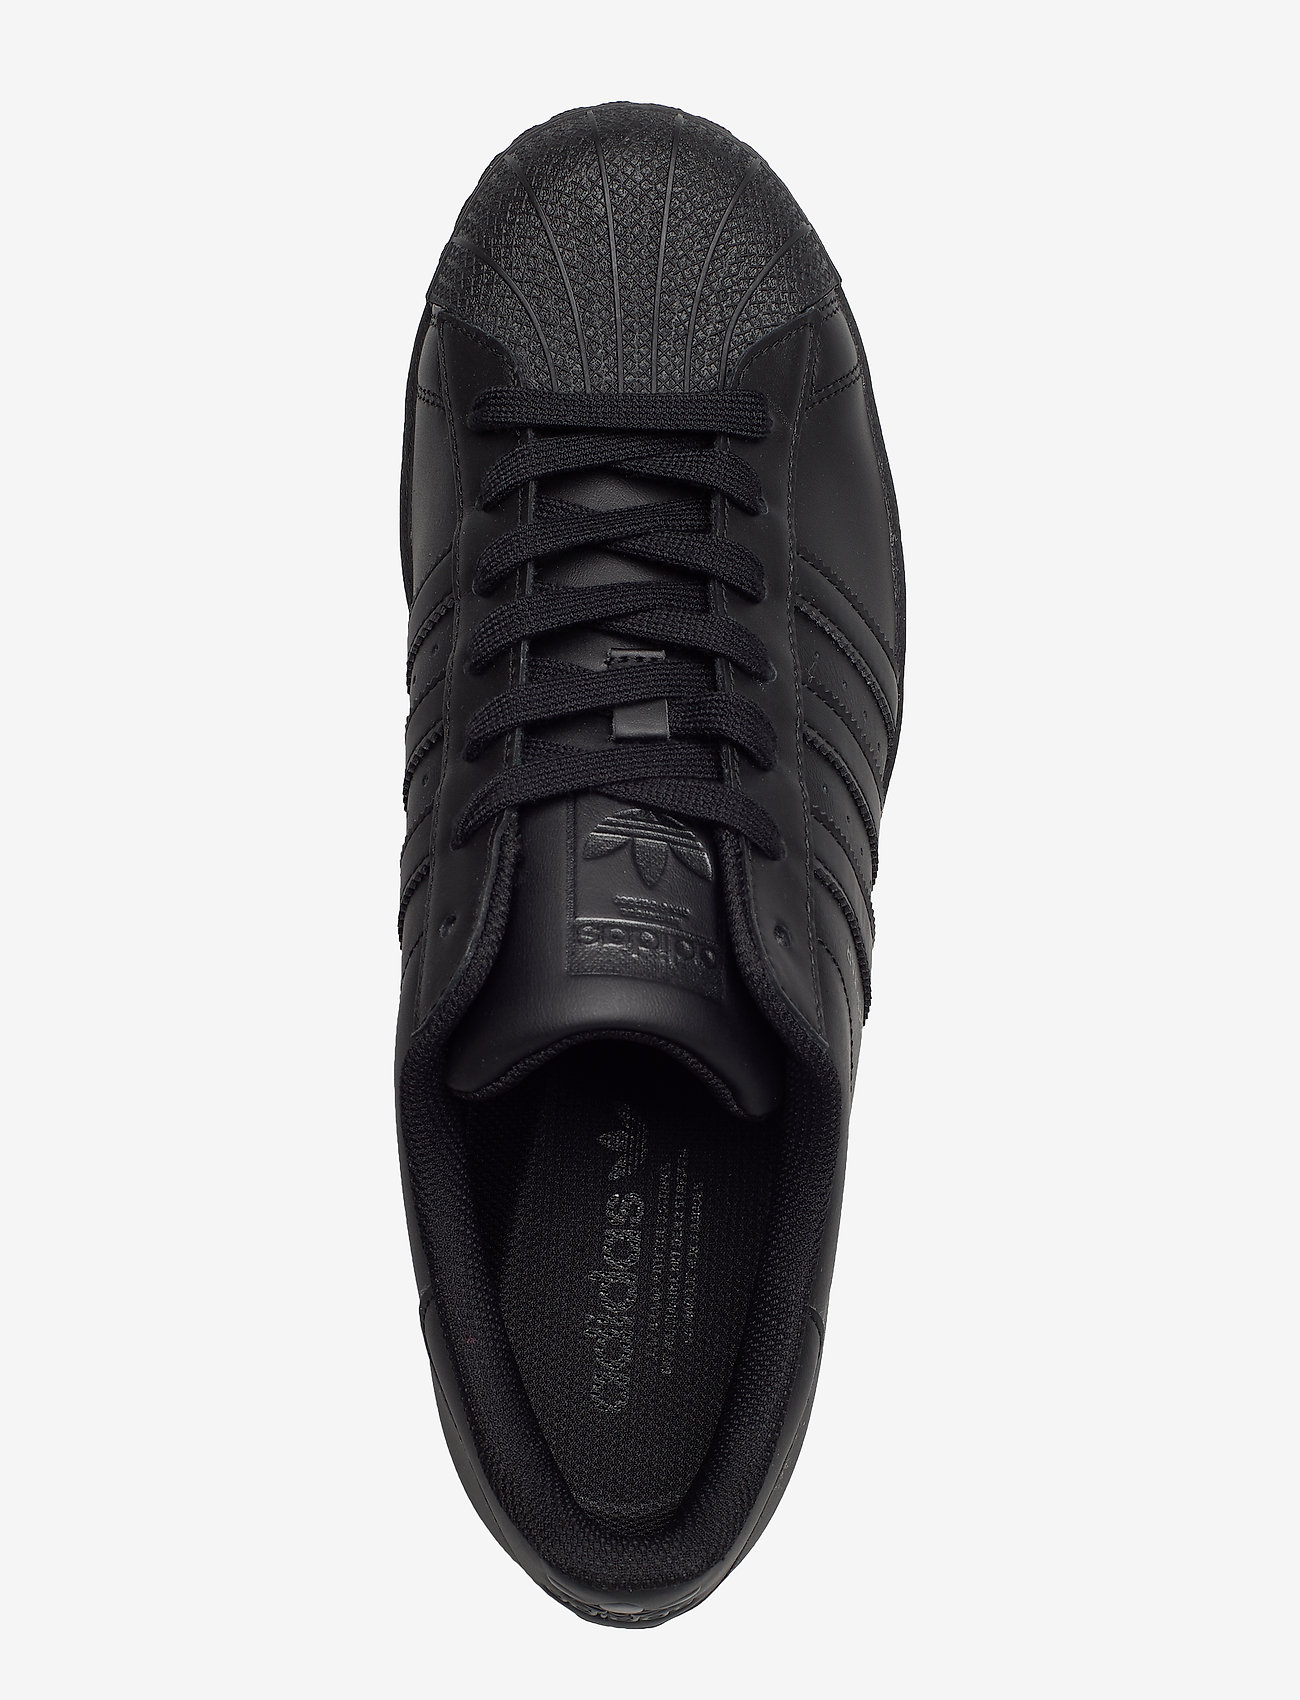 Superstar (Cblack/cblack/cblack) - adidas Originals